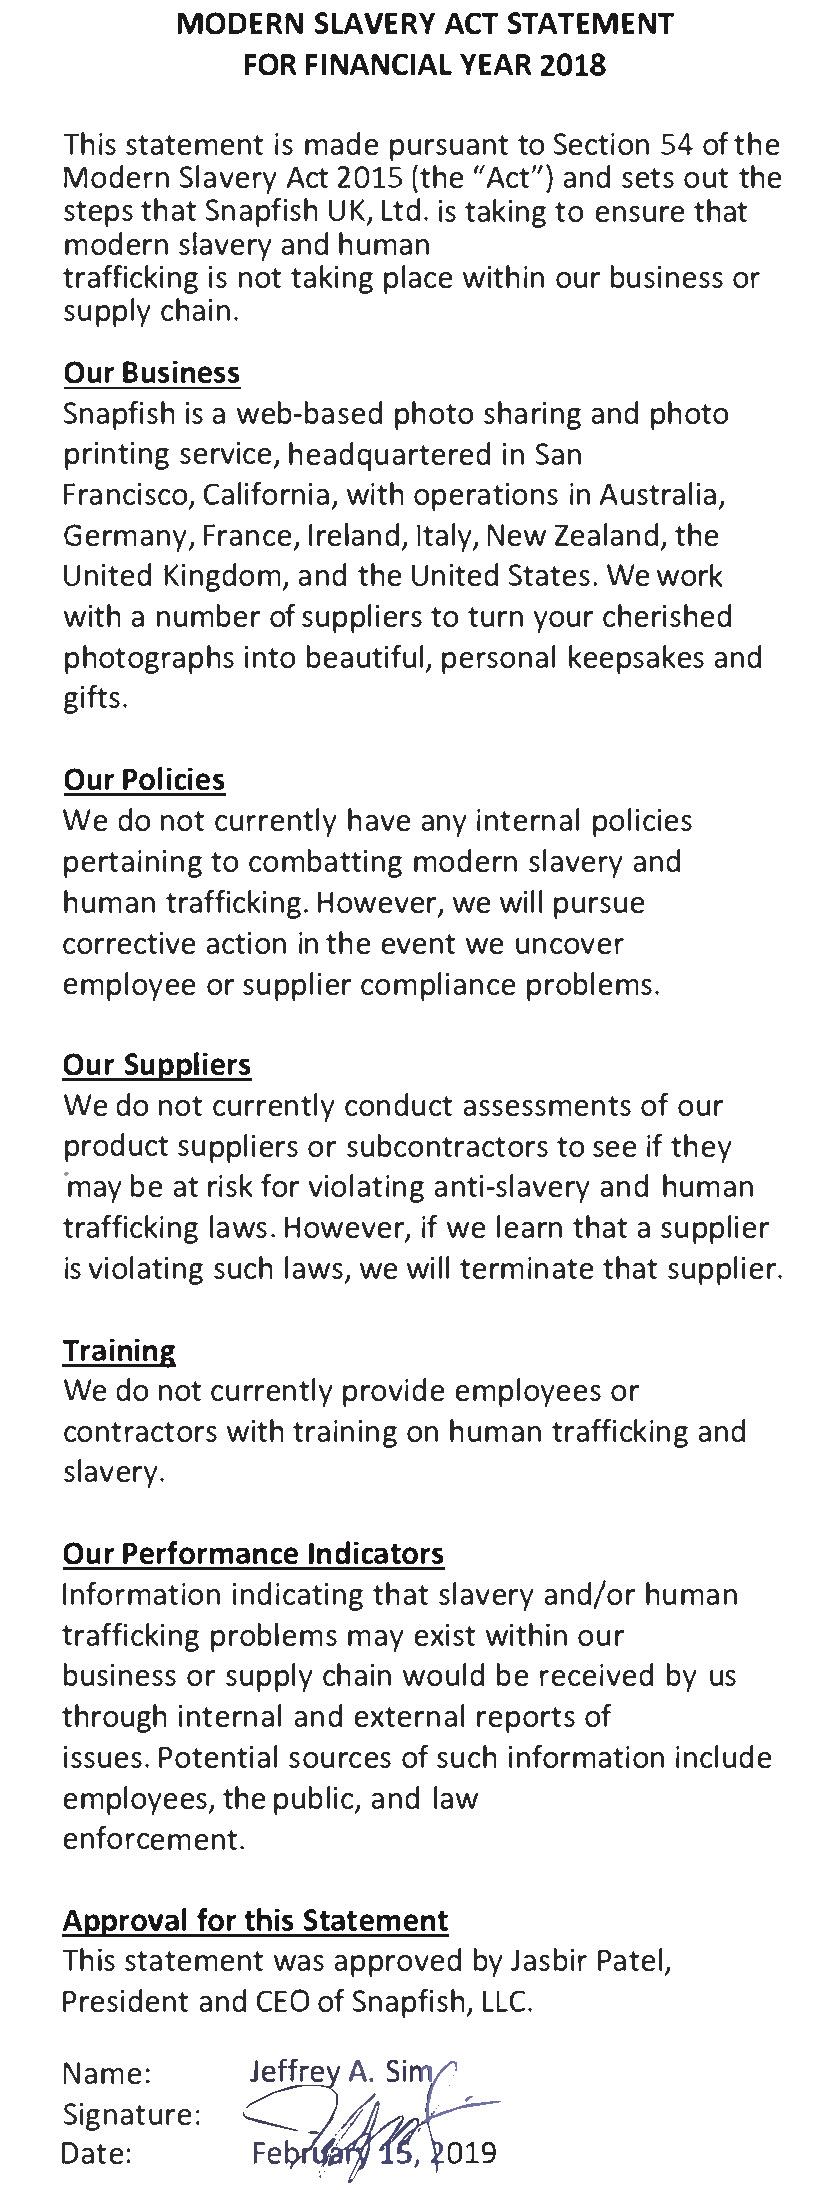 IMAGE OF MODERN SLAVERY STATEMENT